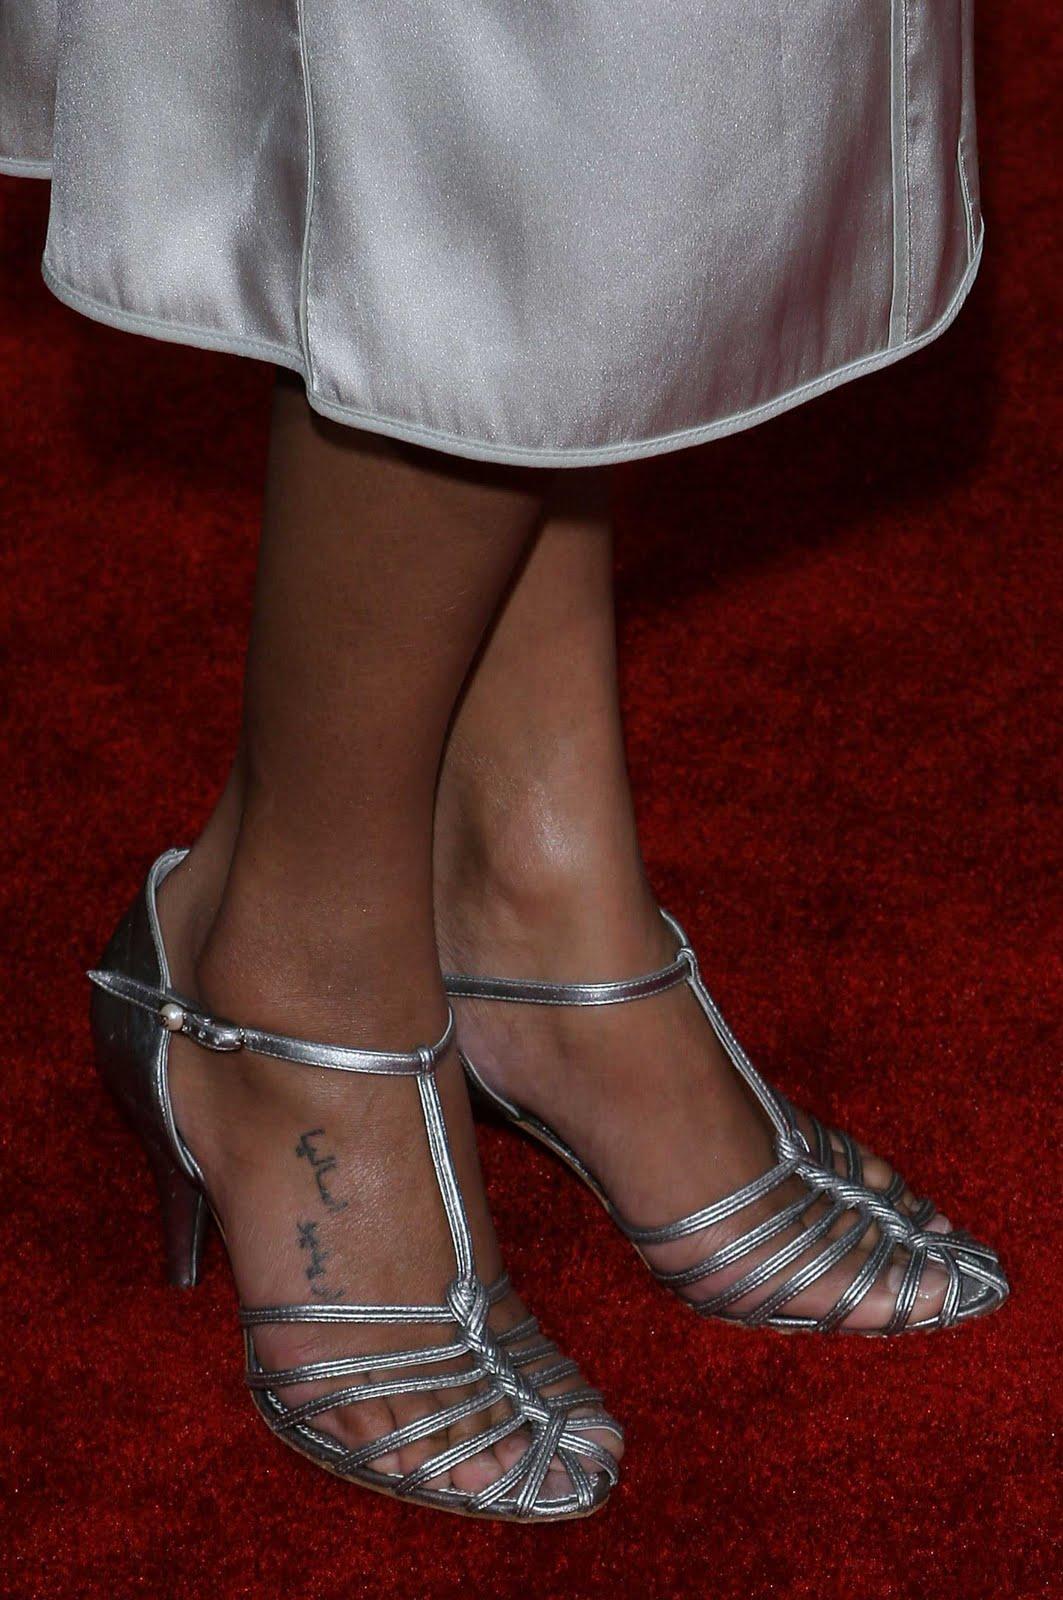 zoe-saldana-feet-2 jpgZoe Saldana Feet